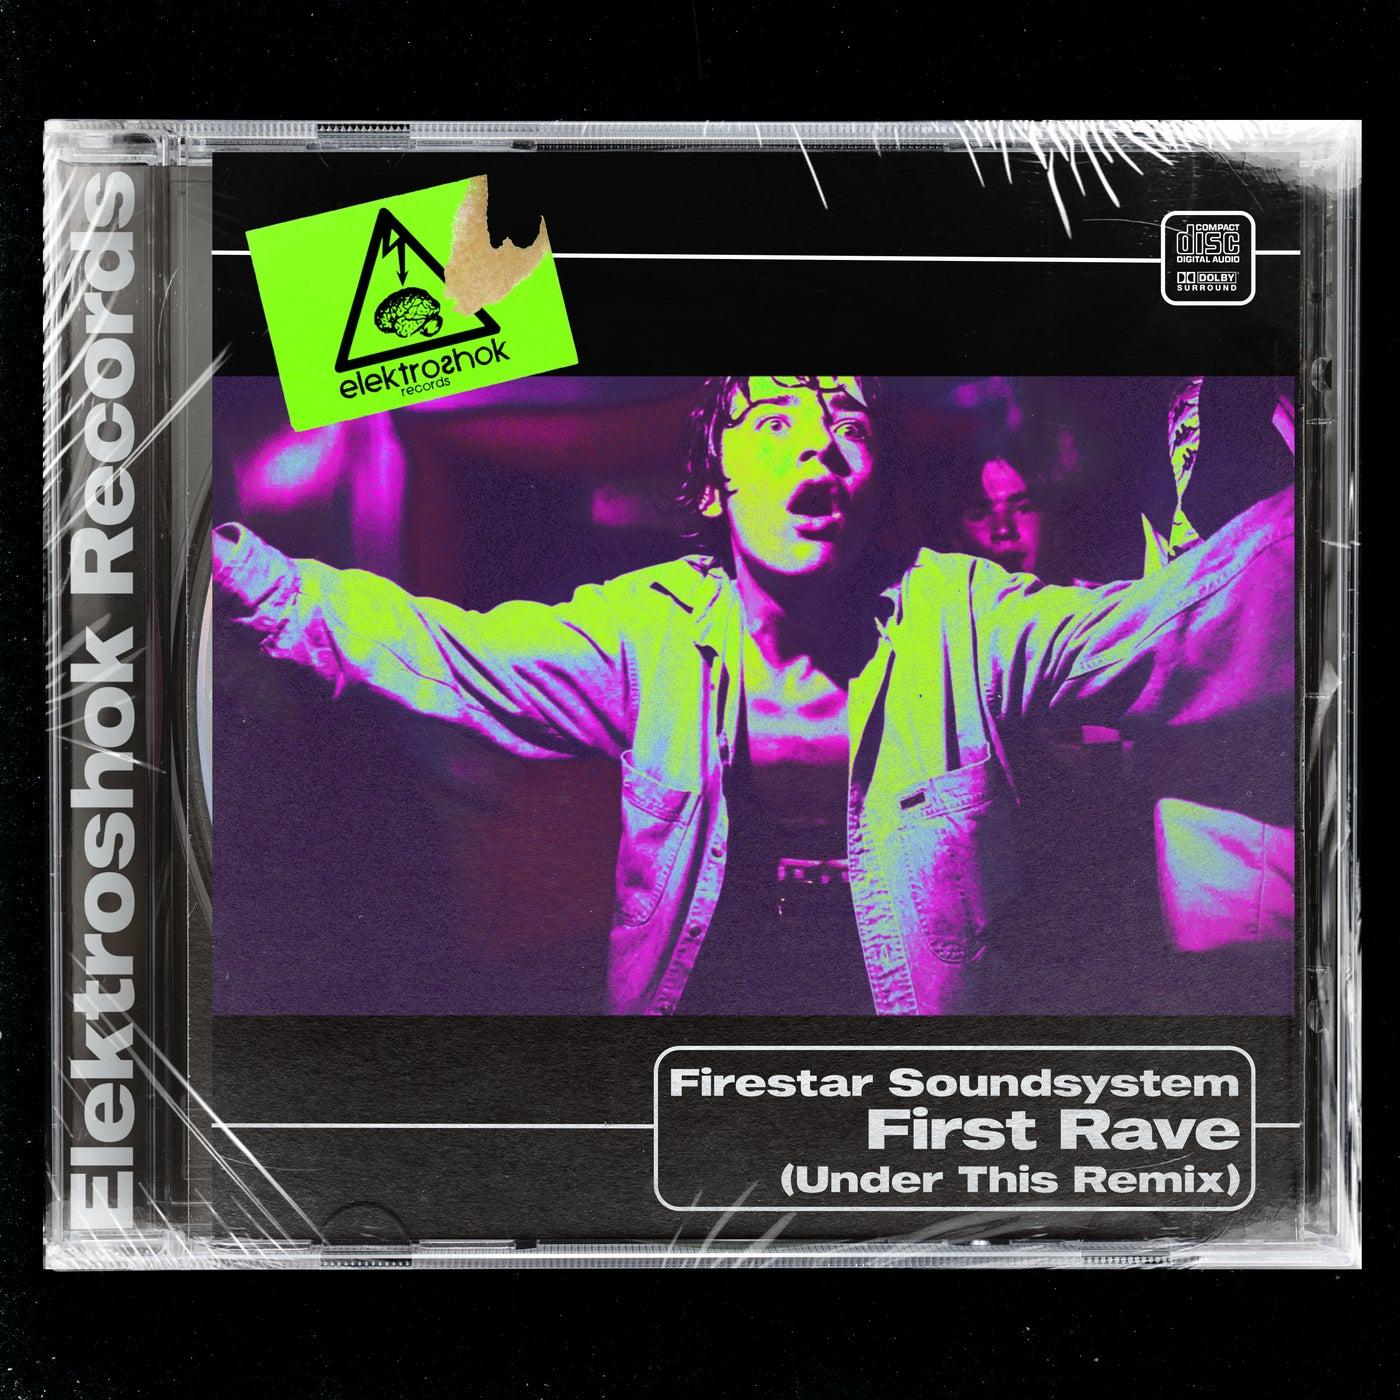 First Rave (Under This Remix)